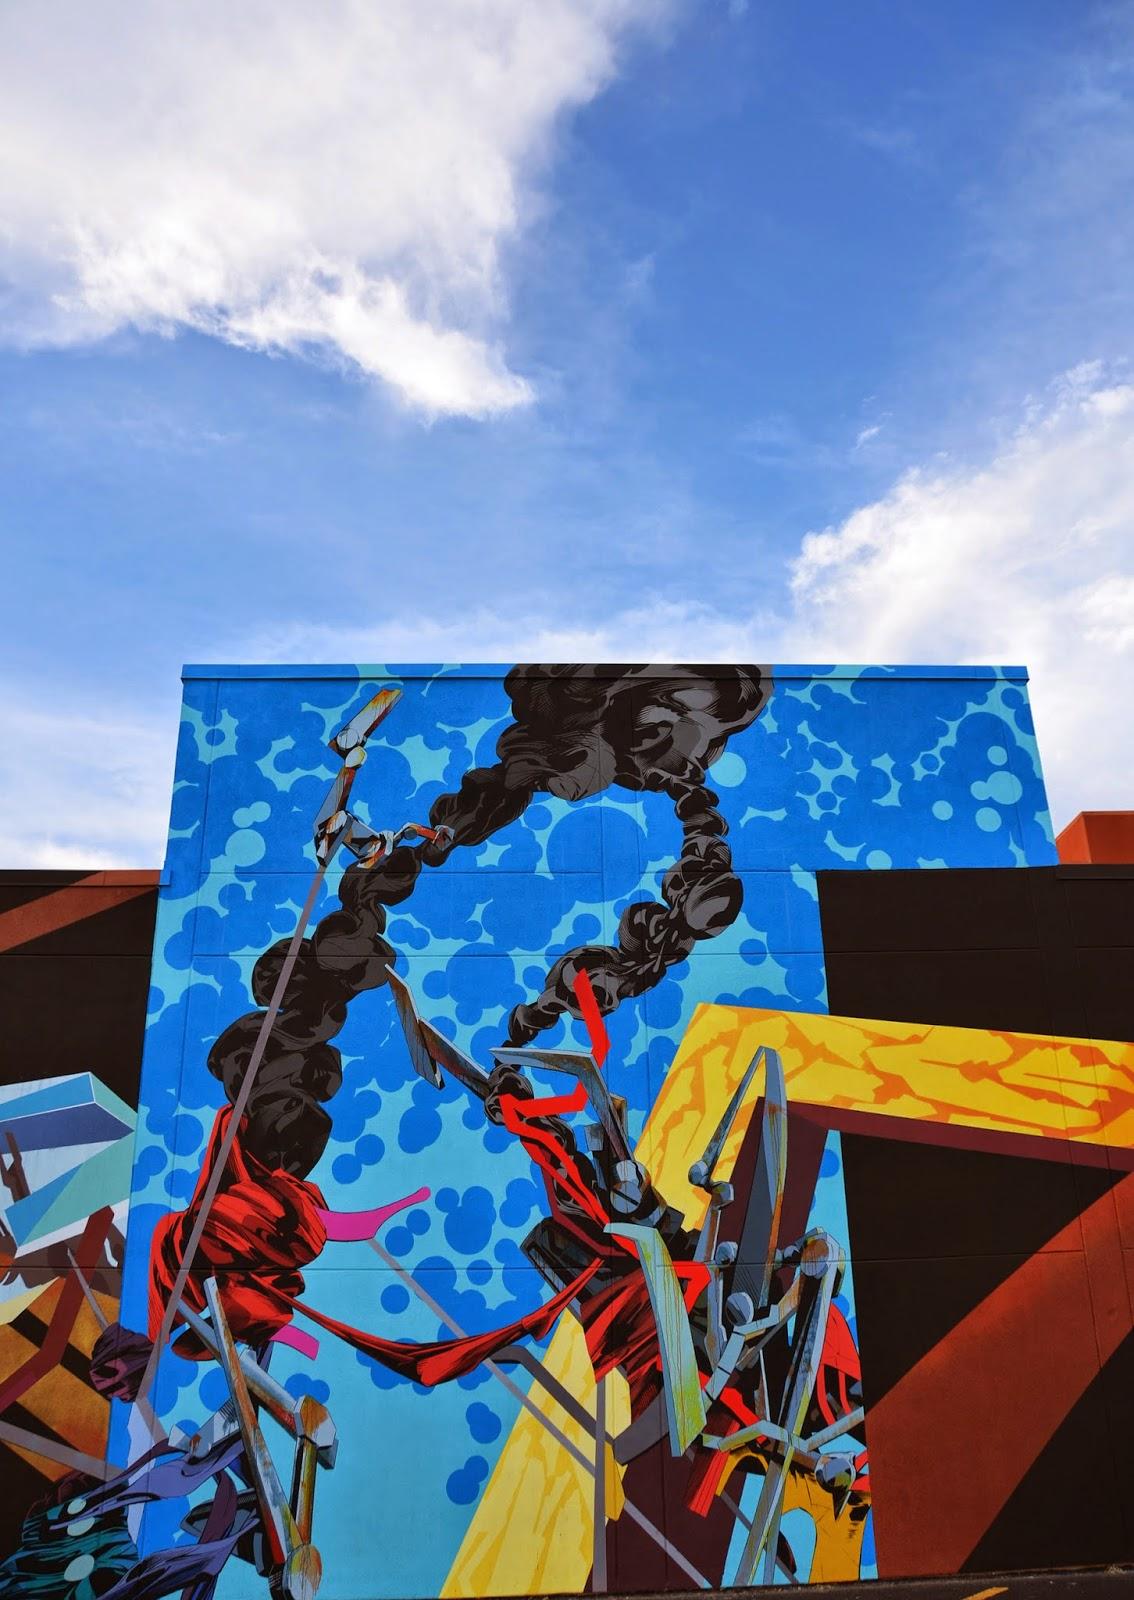 Heidi Utz Photography, Heidi Utz, Albuquerque murals